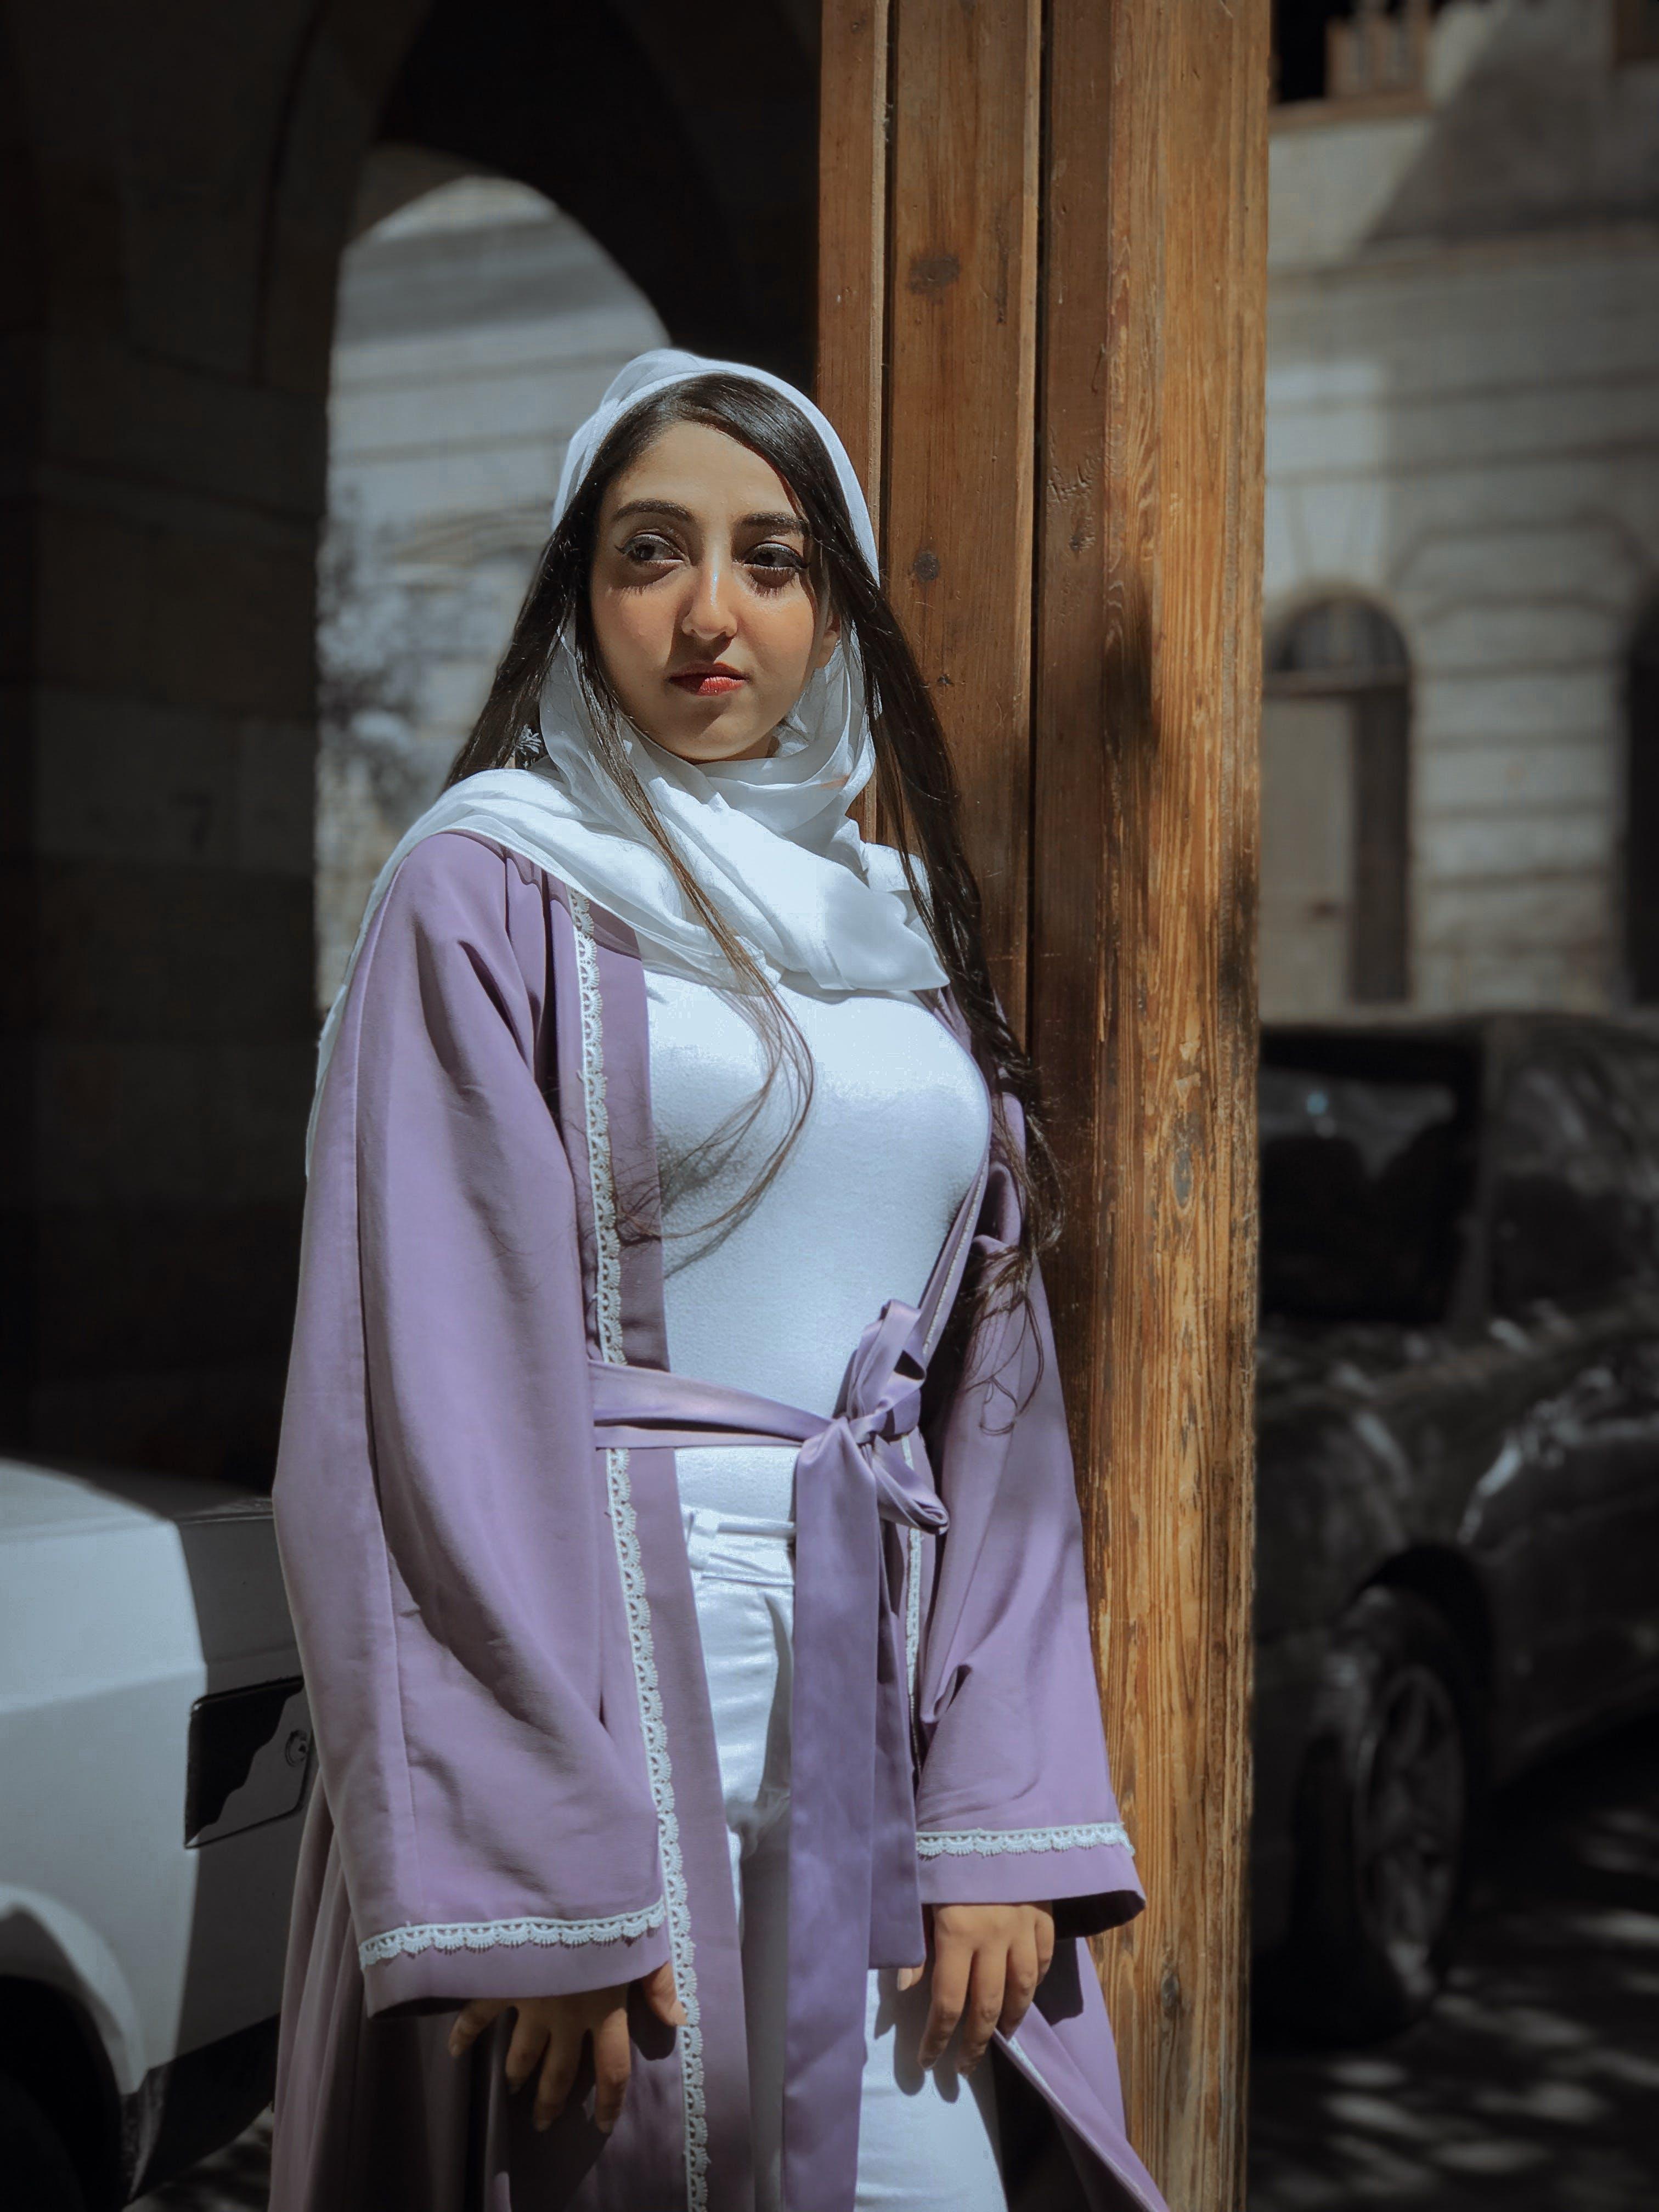 Kostenloses Stock Foto zu fashion, frau, hijab, hübsch